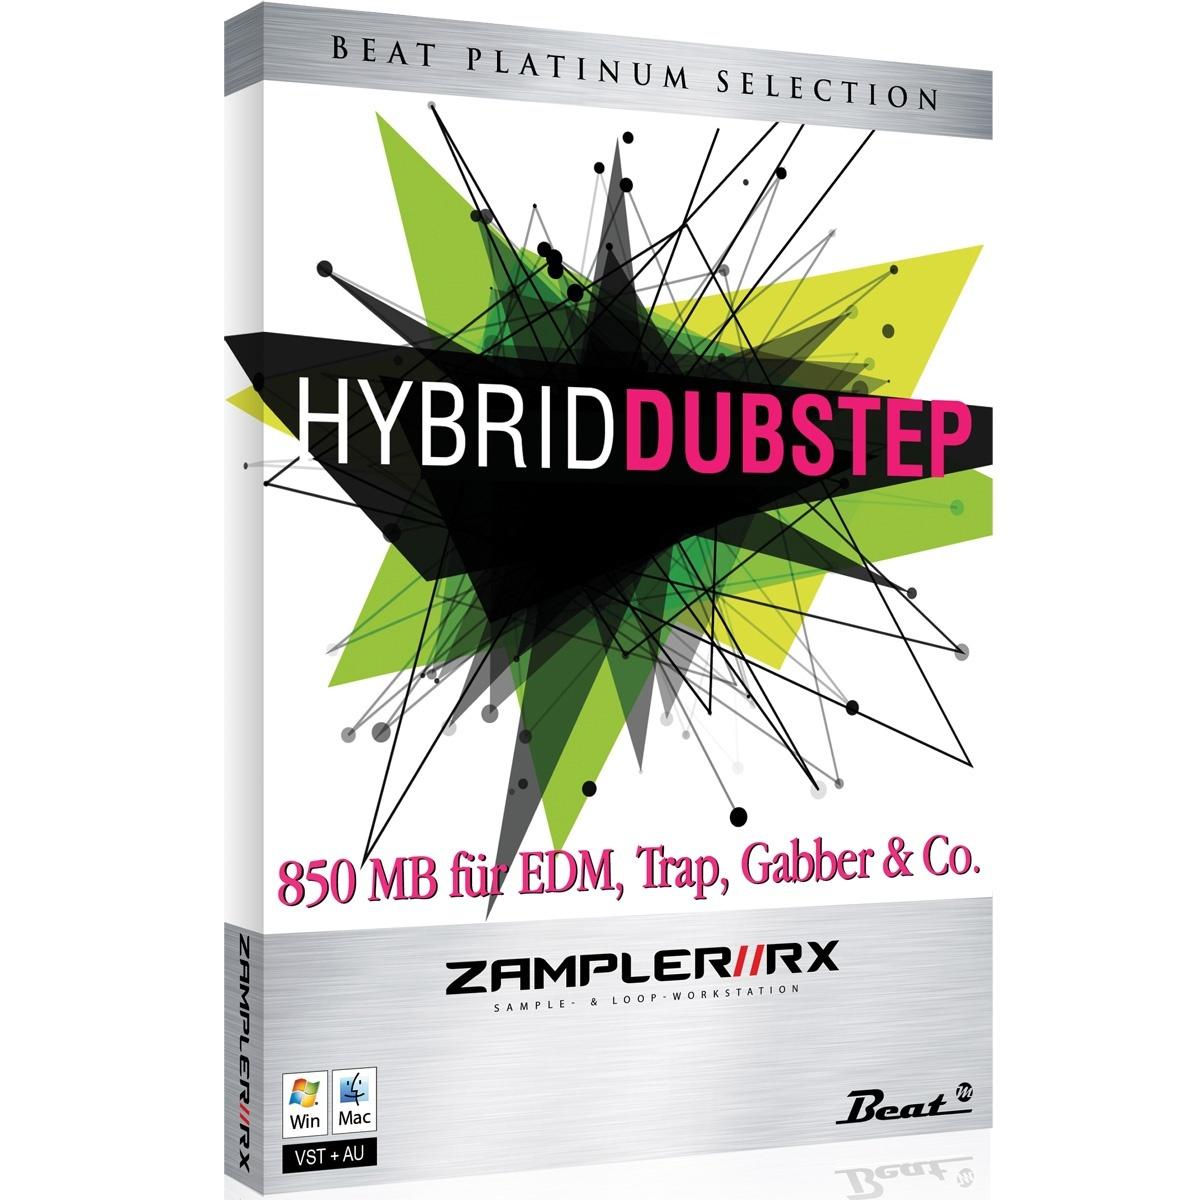 HYBRID DUBSTEP – Sound bank for Zampler//RX workstation (Win/OSX plugin included)